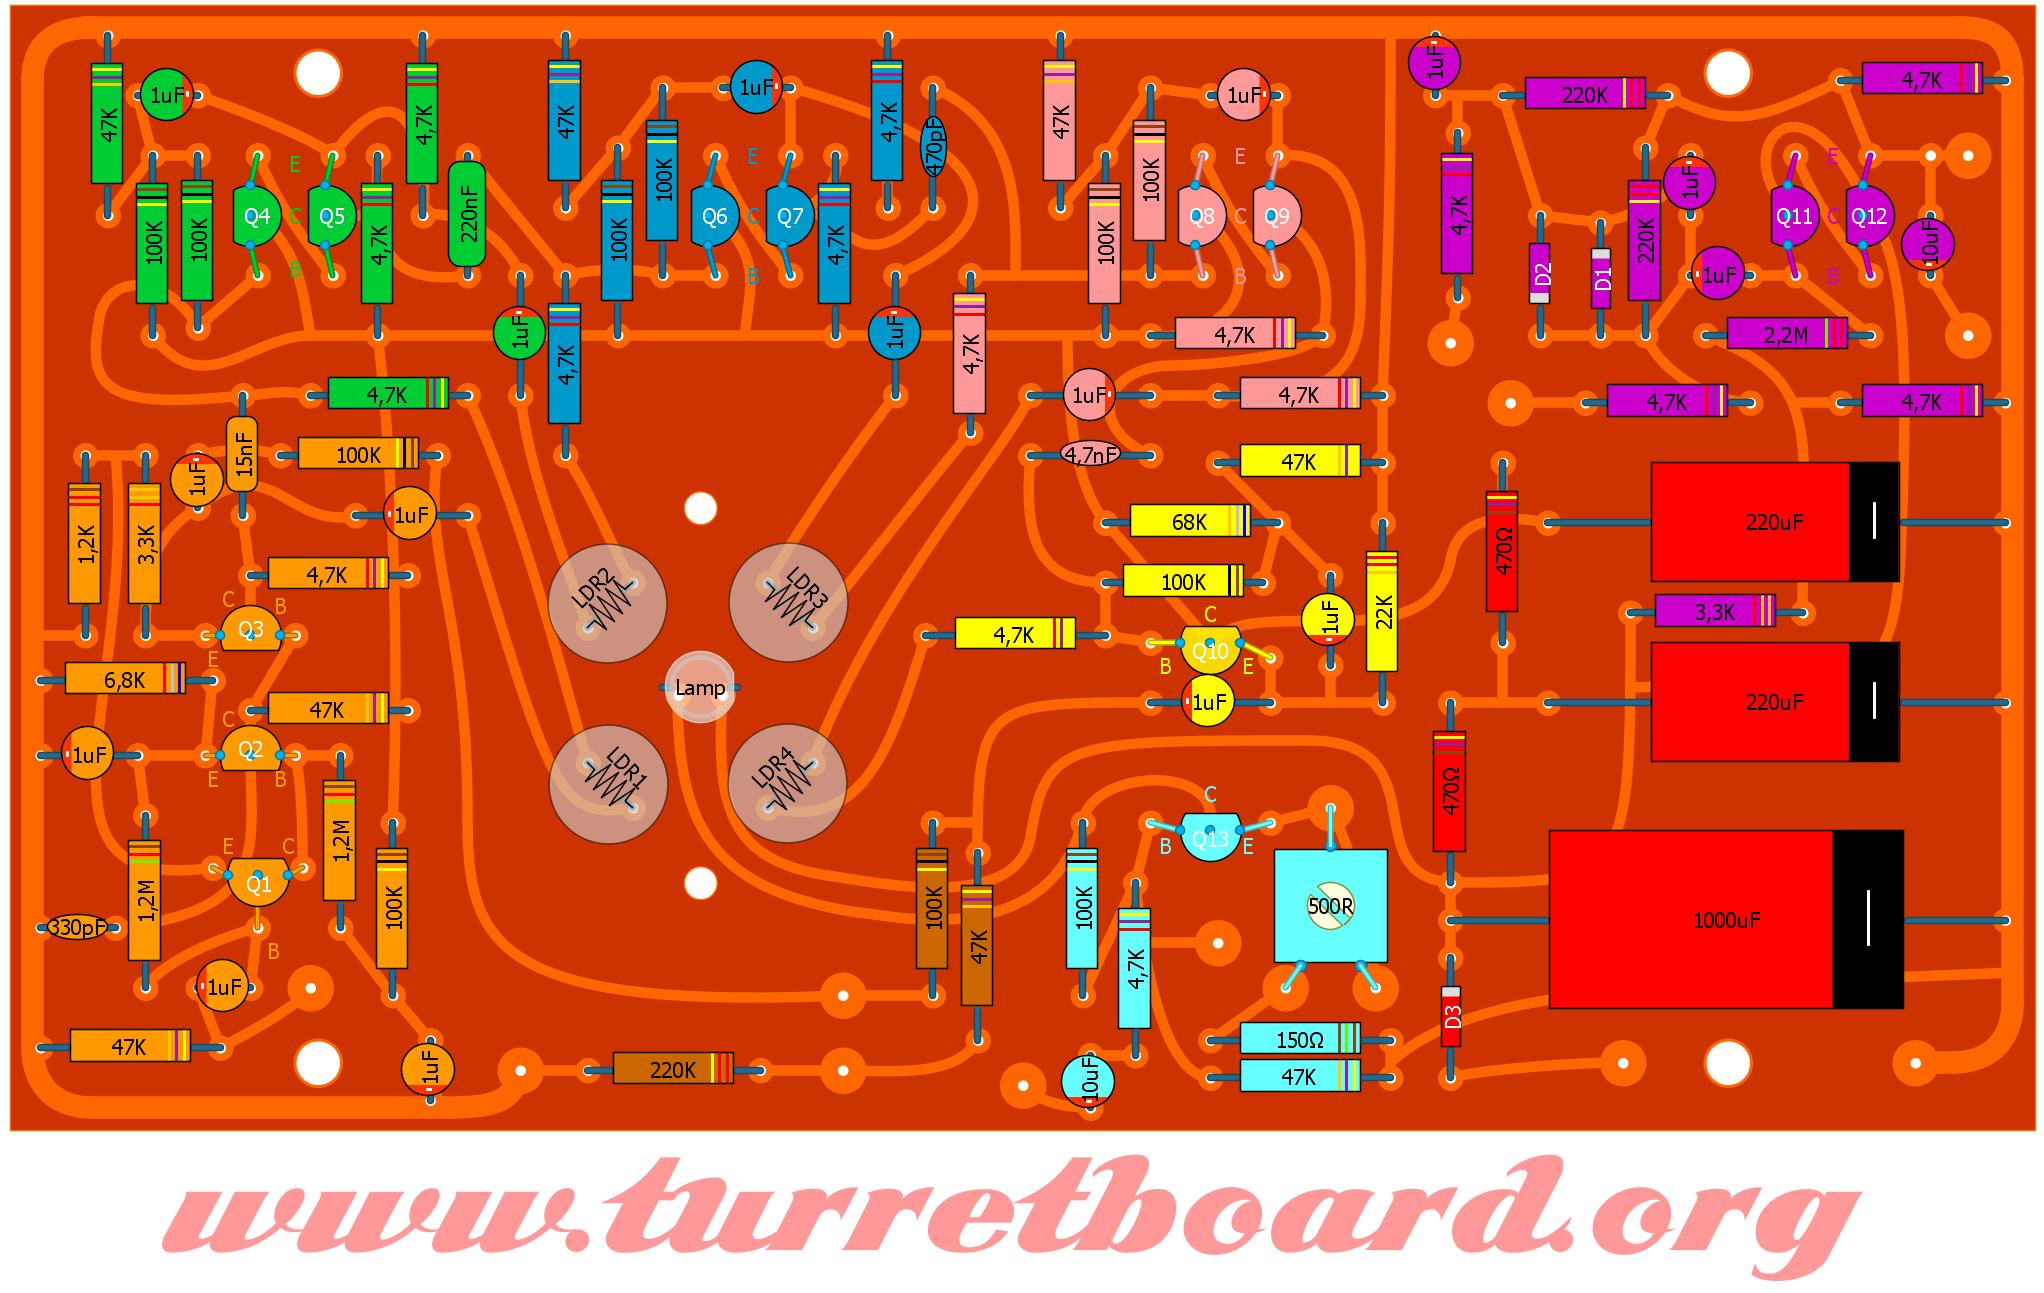 diy-layout-creator - Free multi-platform electronic schematic ...